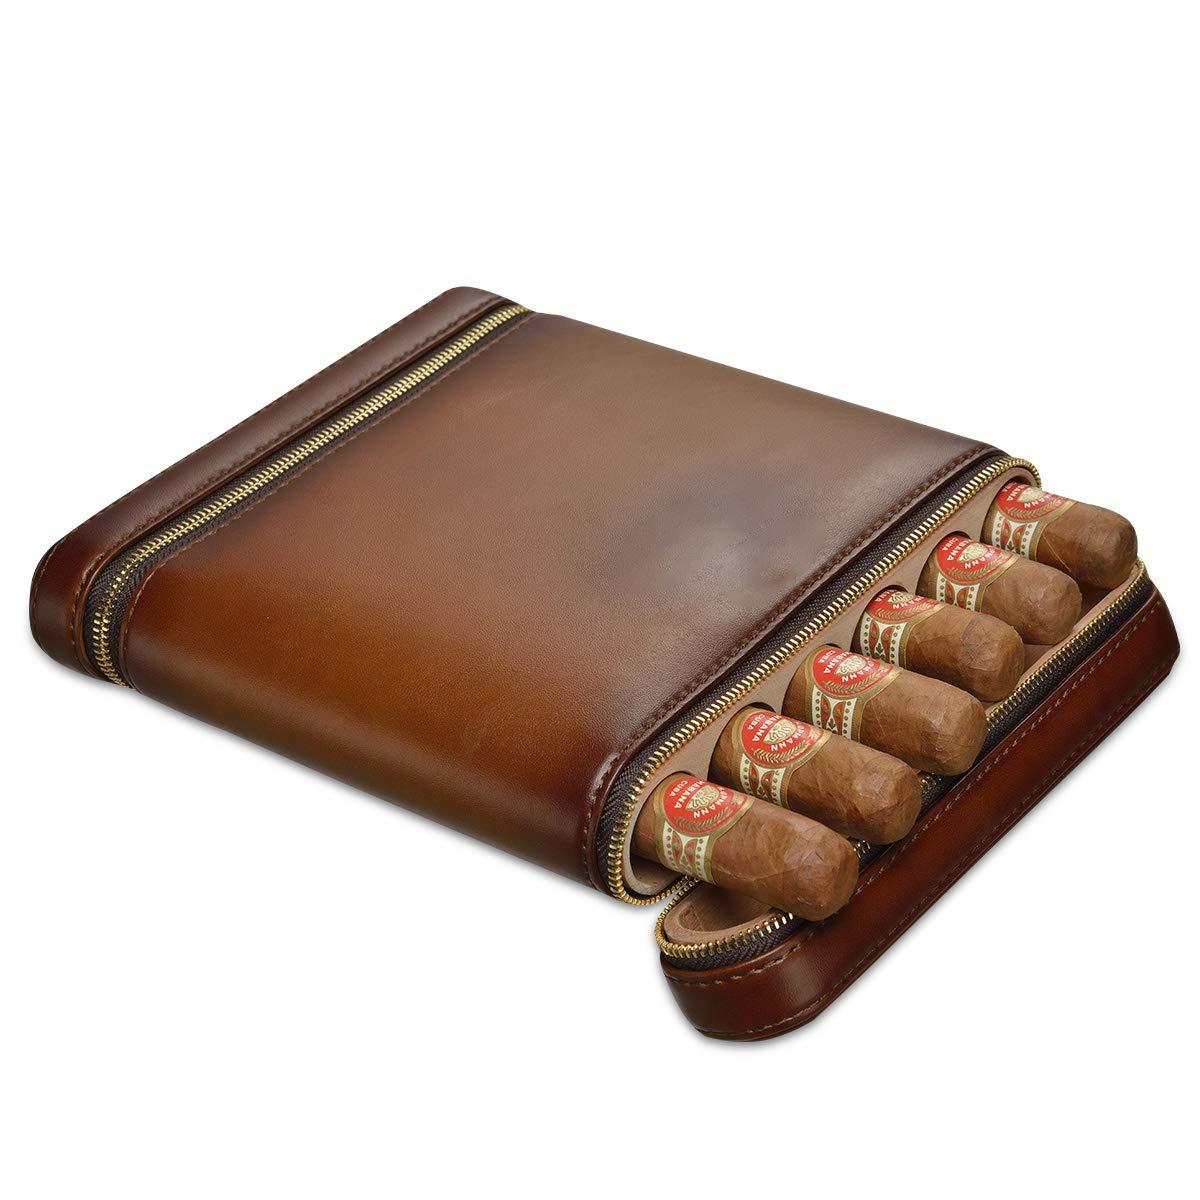 CIGARLOONG Cigar Humidor Travel Case Built-in Cedar Wood Portable 6 Cigars Box(Brown)